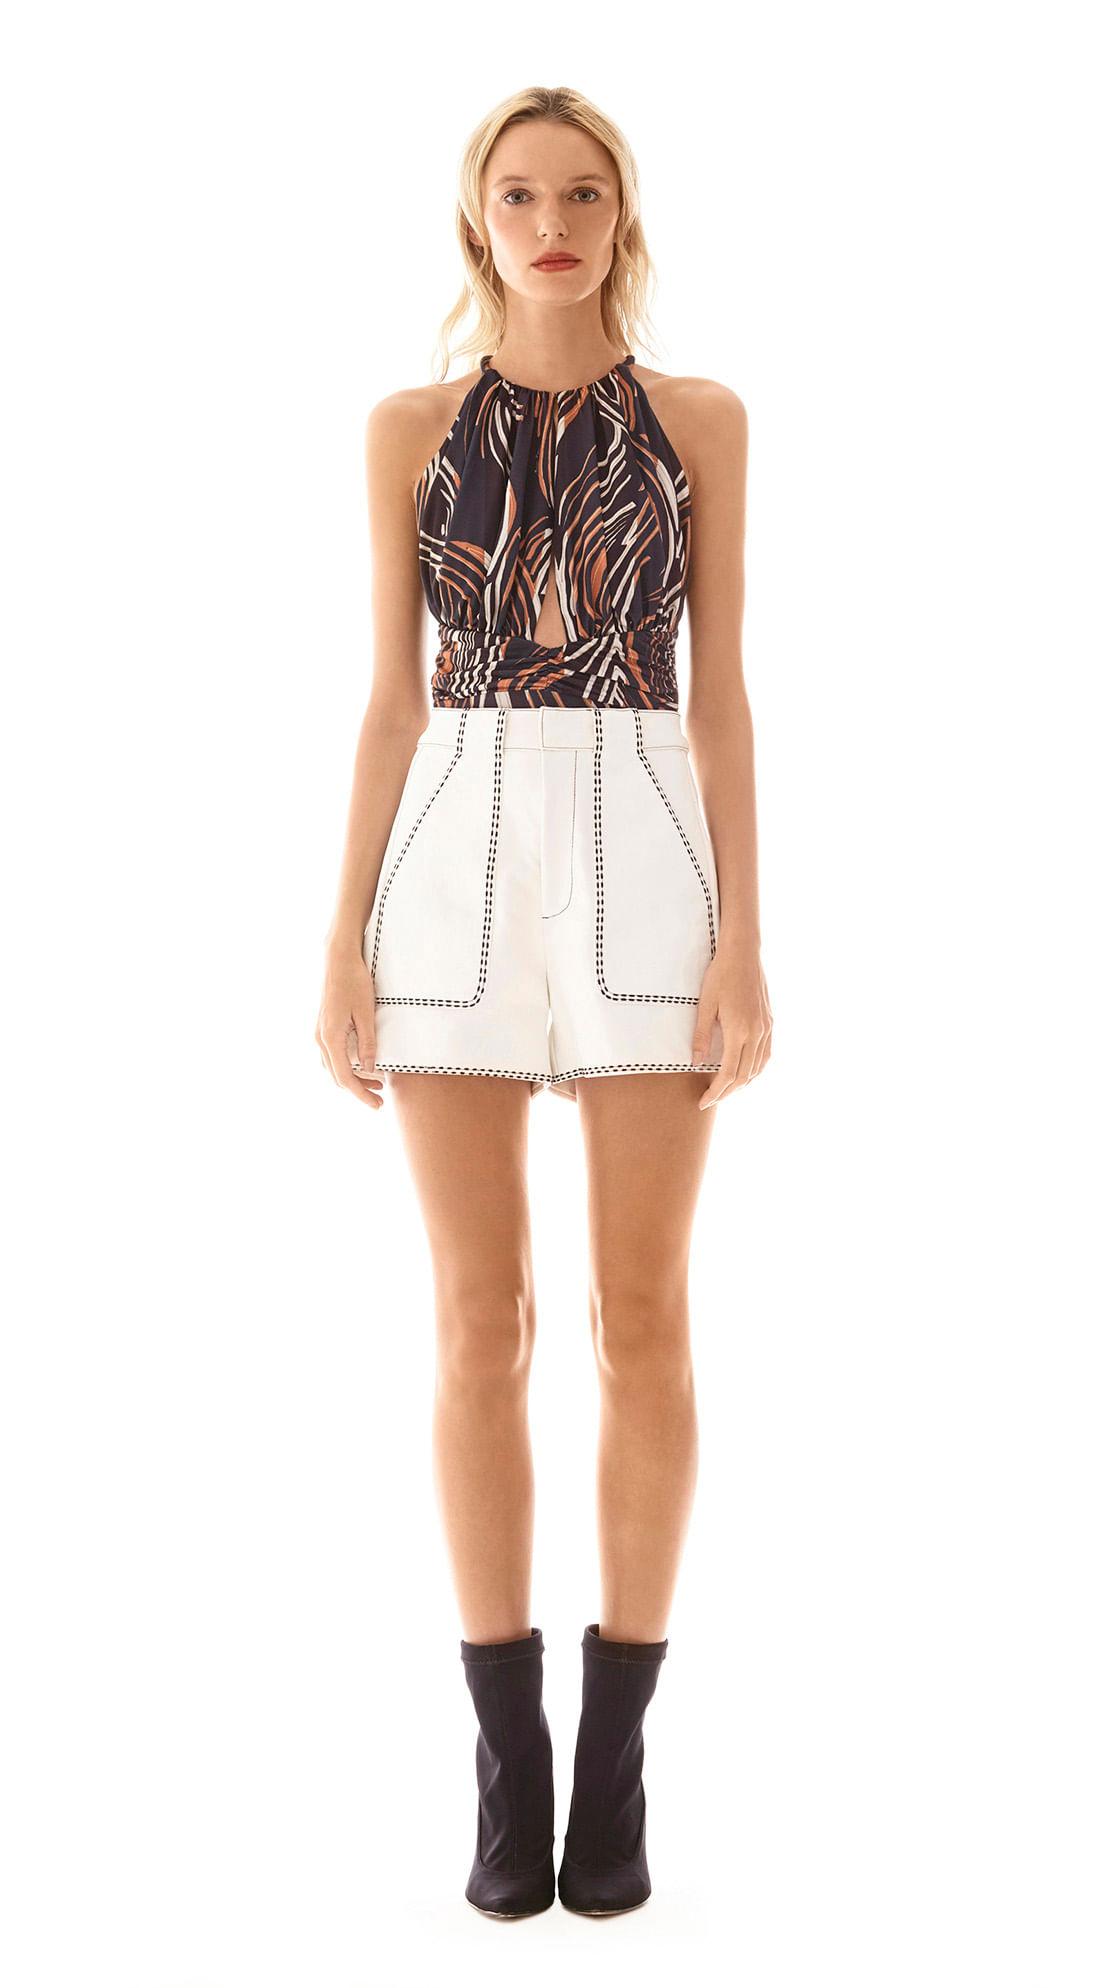 81694147d Shorts Alfaiataria Detalhe Pesponto Off White - morenarosa